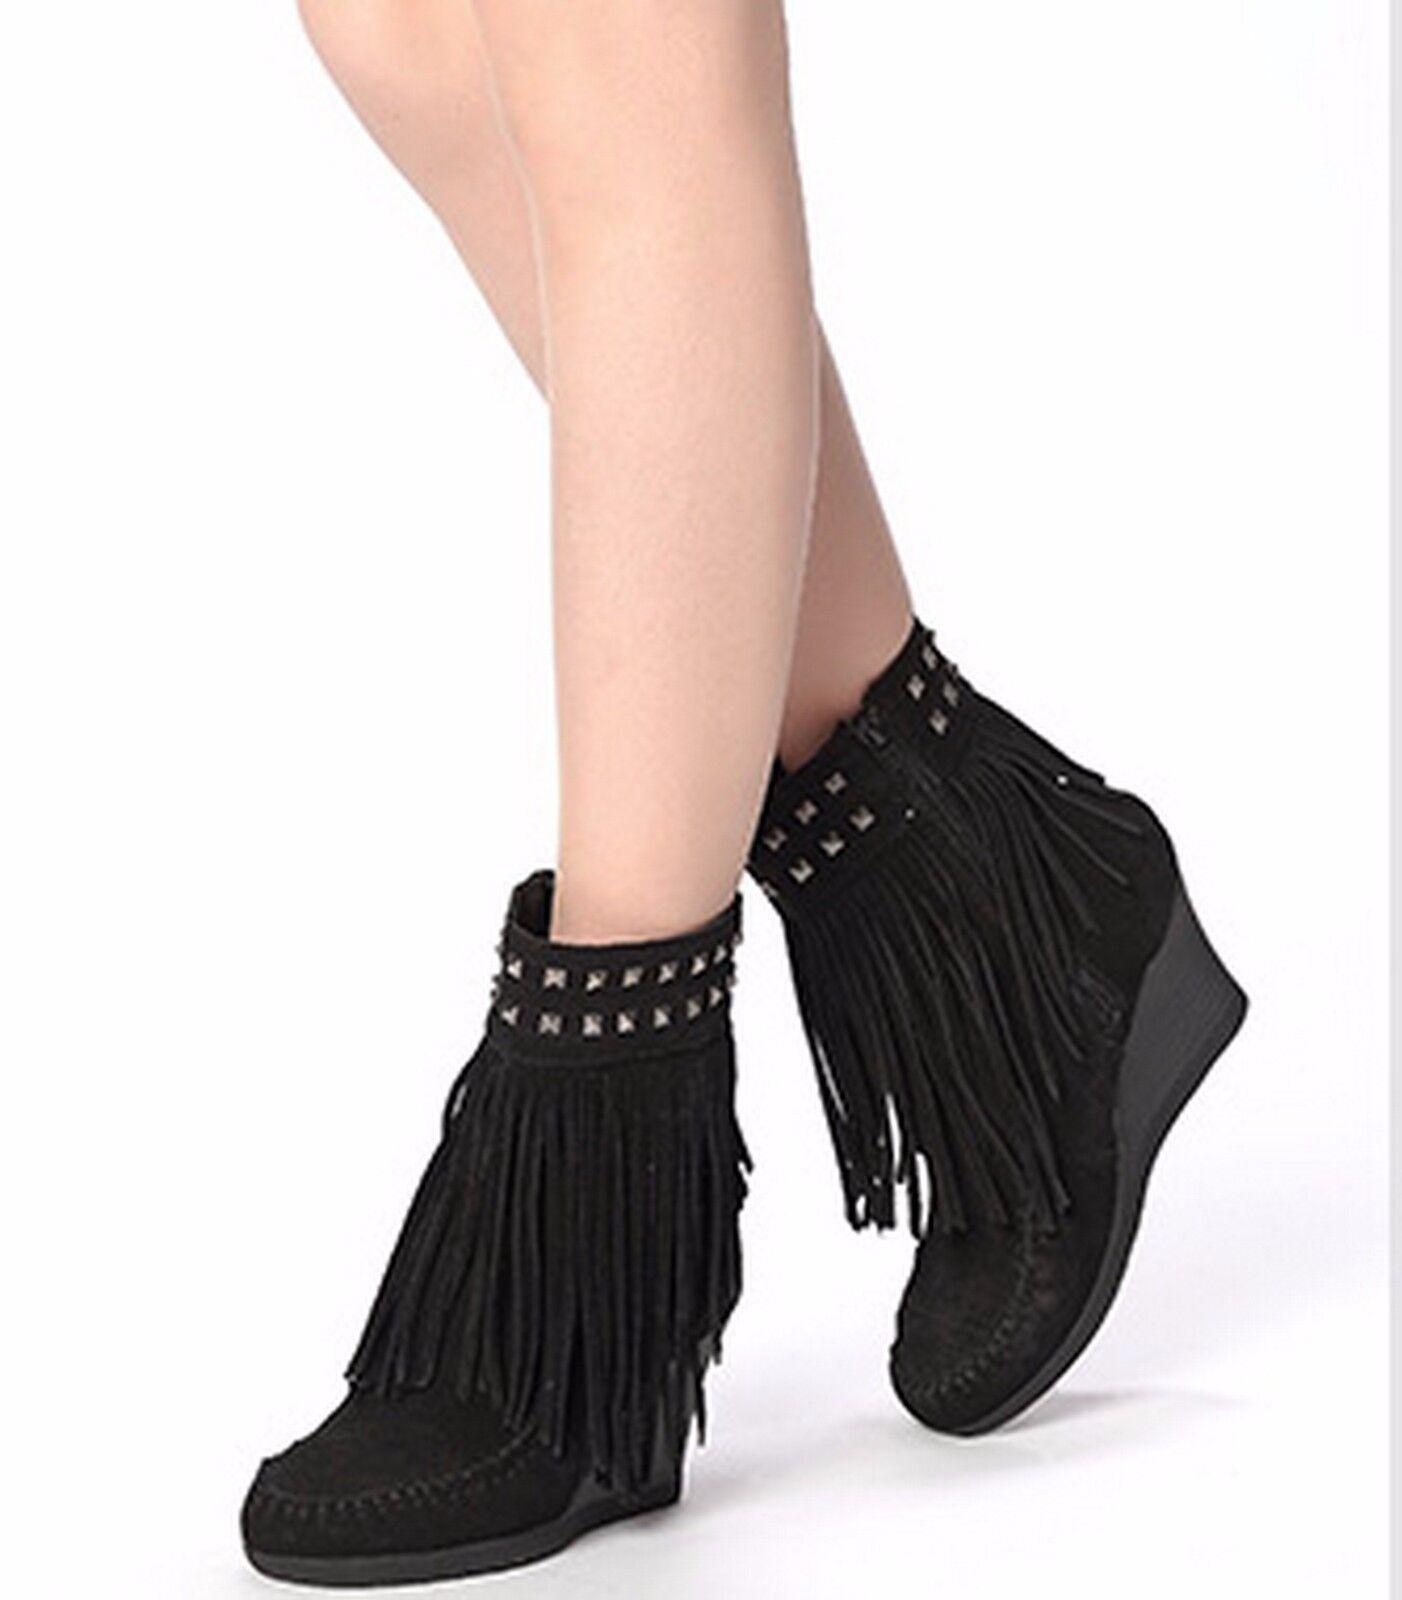 Nueva con caja Minnetonka Botín botas botas botas Zapatos De Gamuza, Negro, 7.5M  costo real